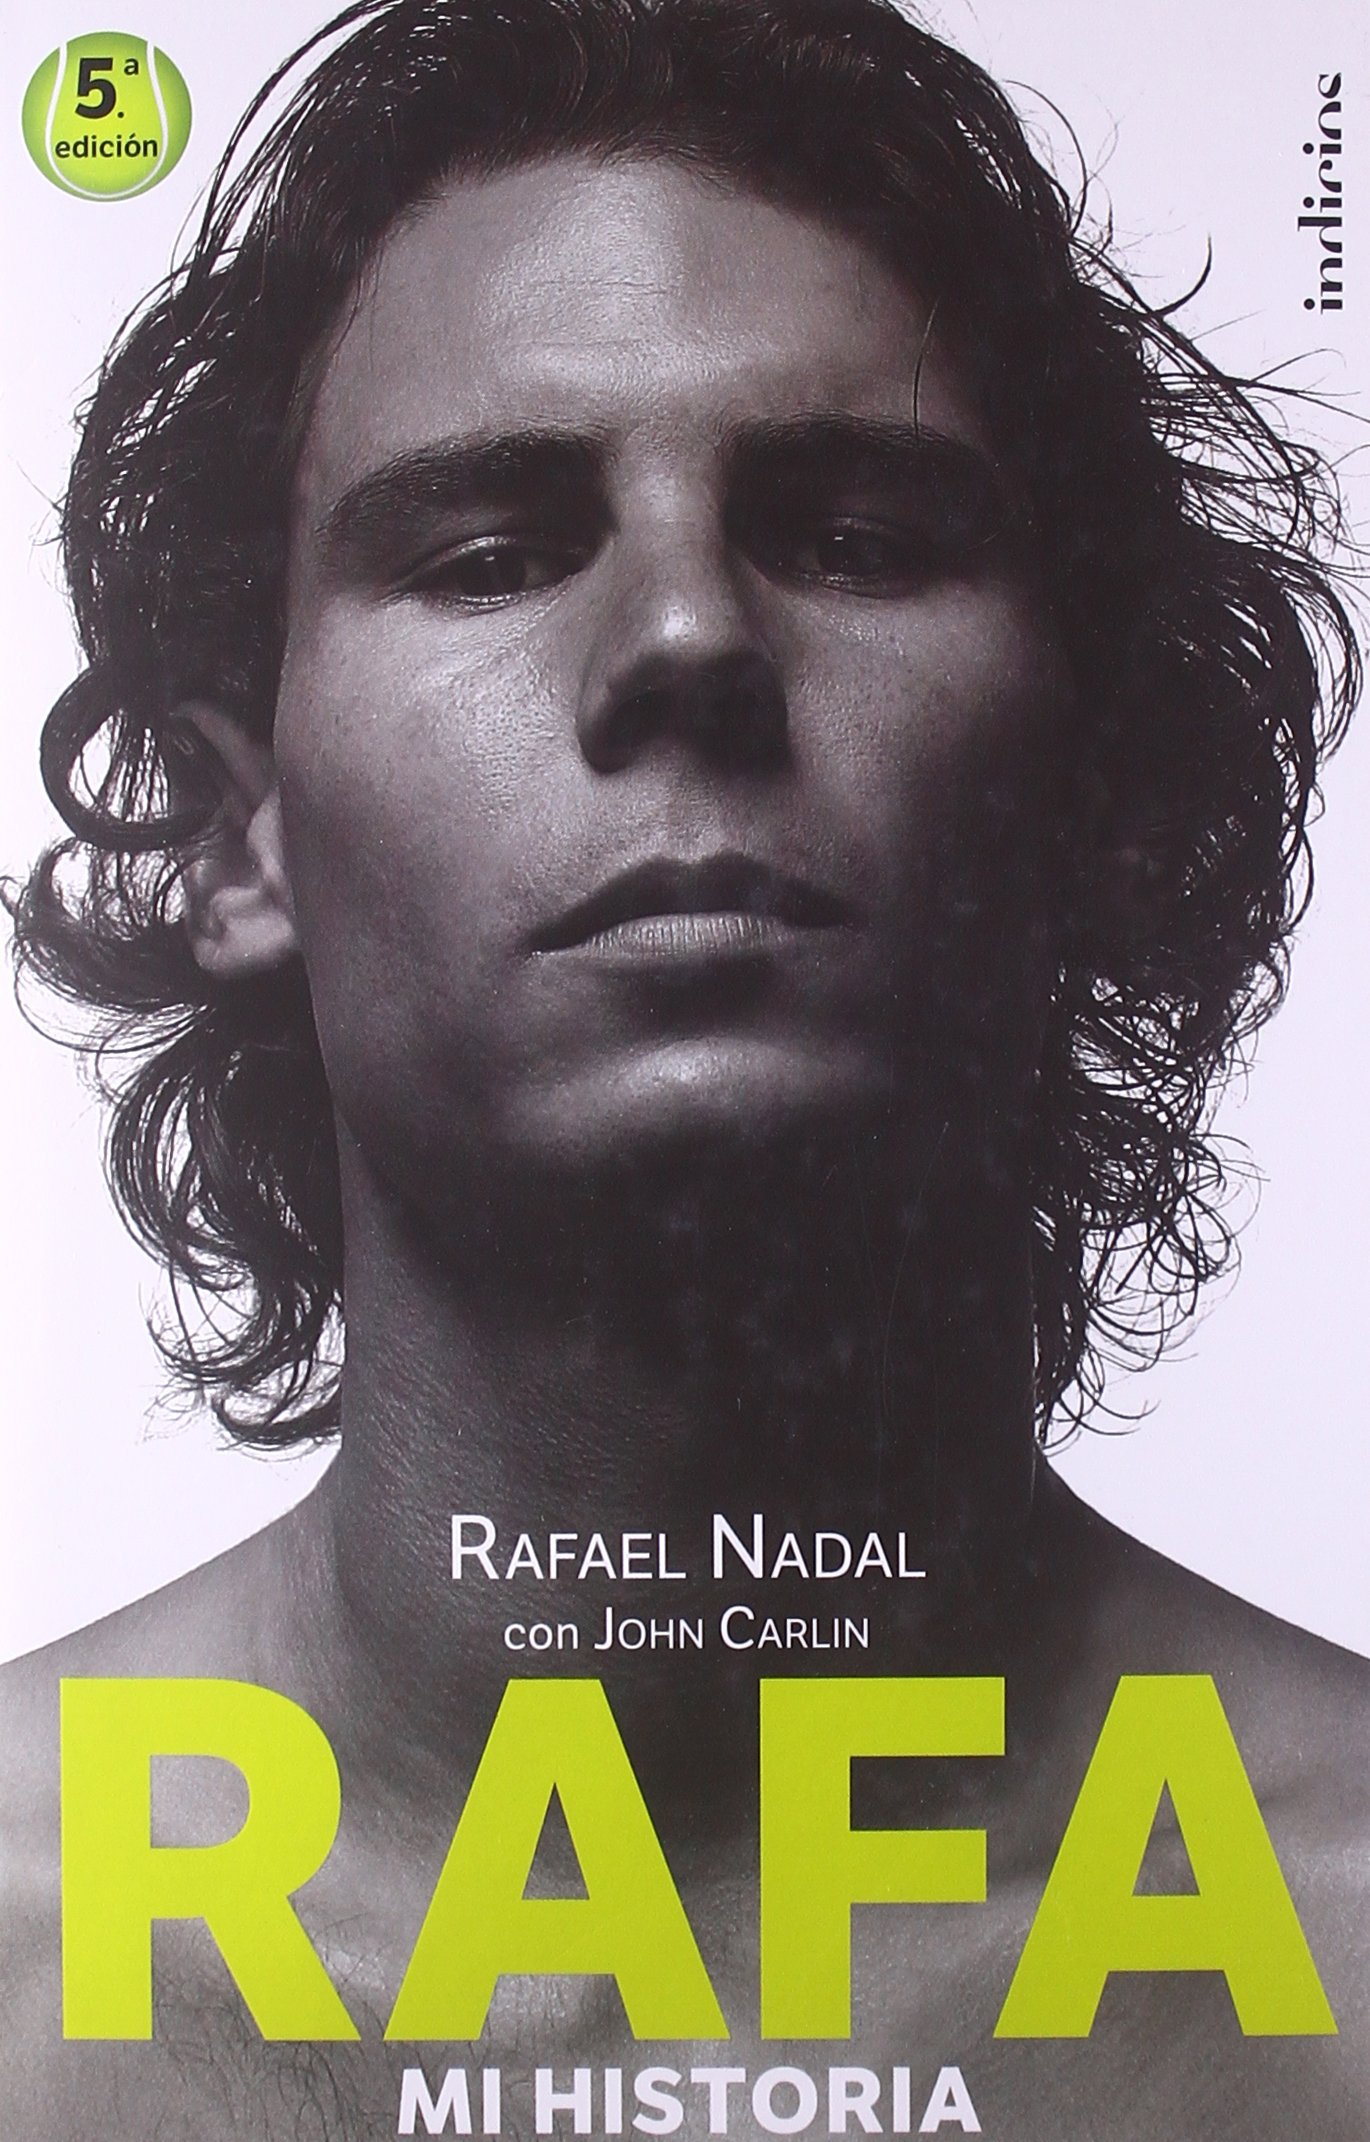 Rafa, mi historia (Spanish Edition) by Urano